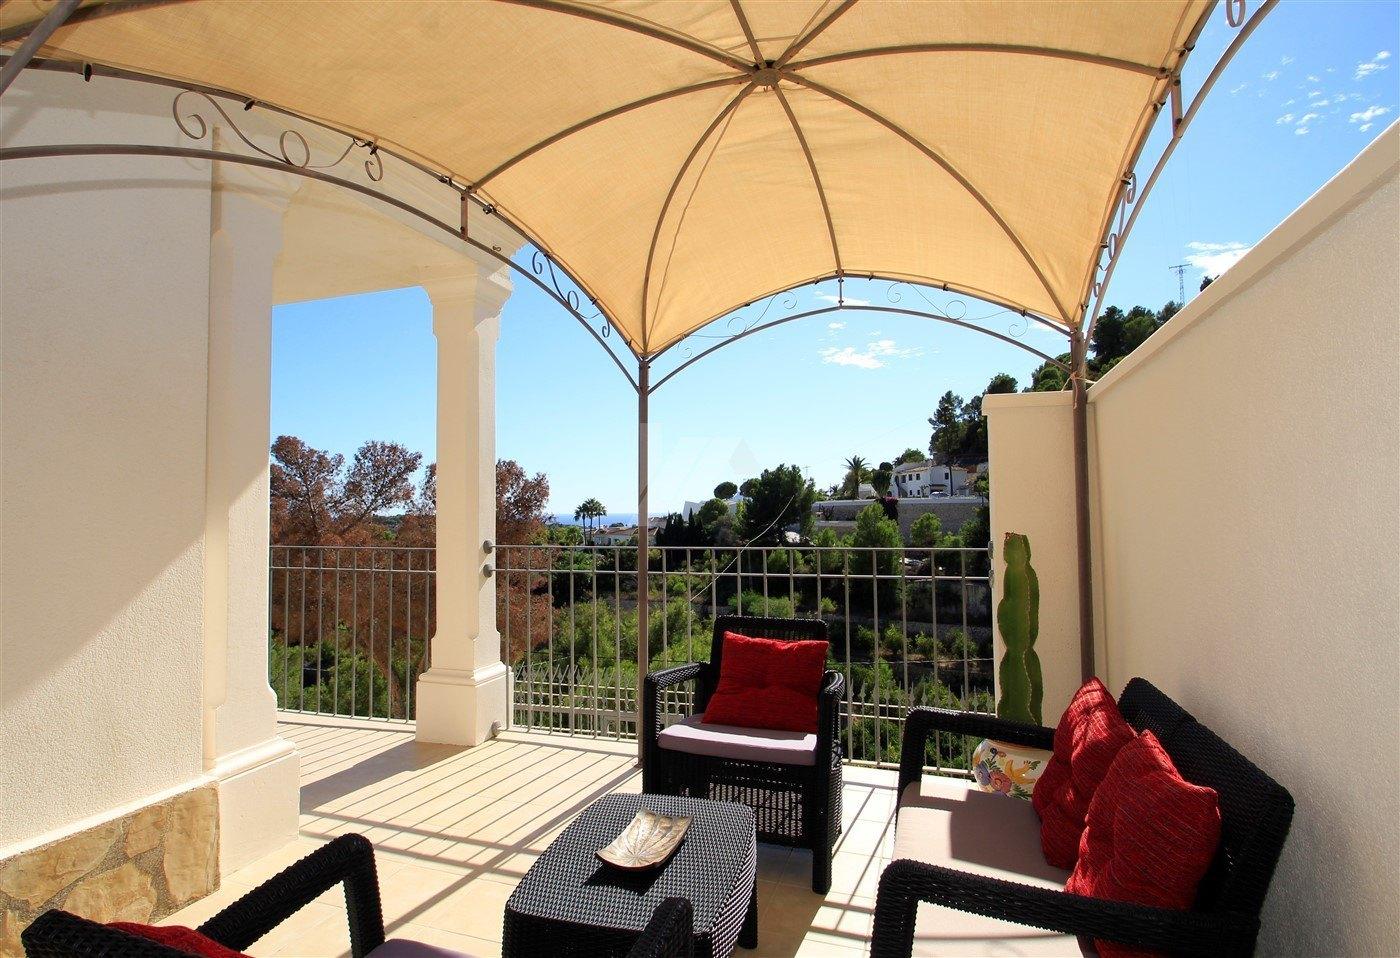 Makellose Meerblick Villa zum Verkauf in Moraira, Costa Blanca.